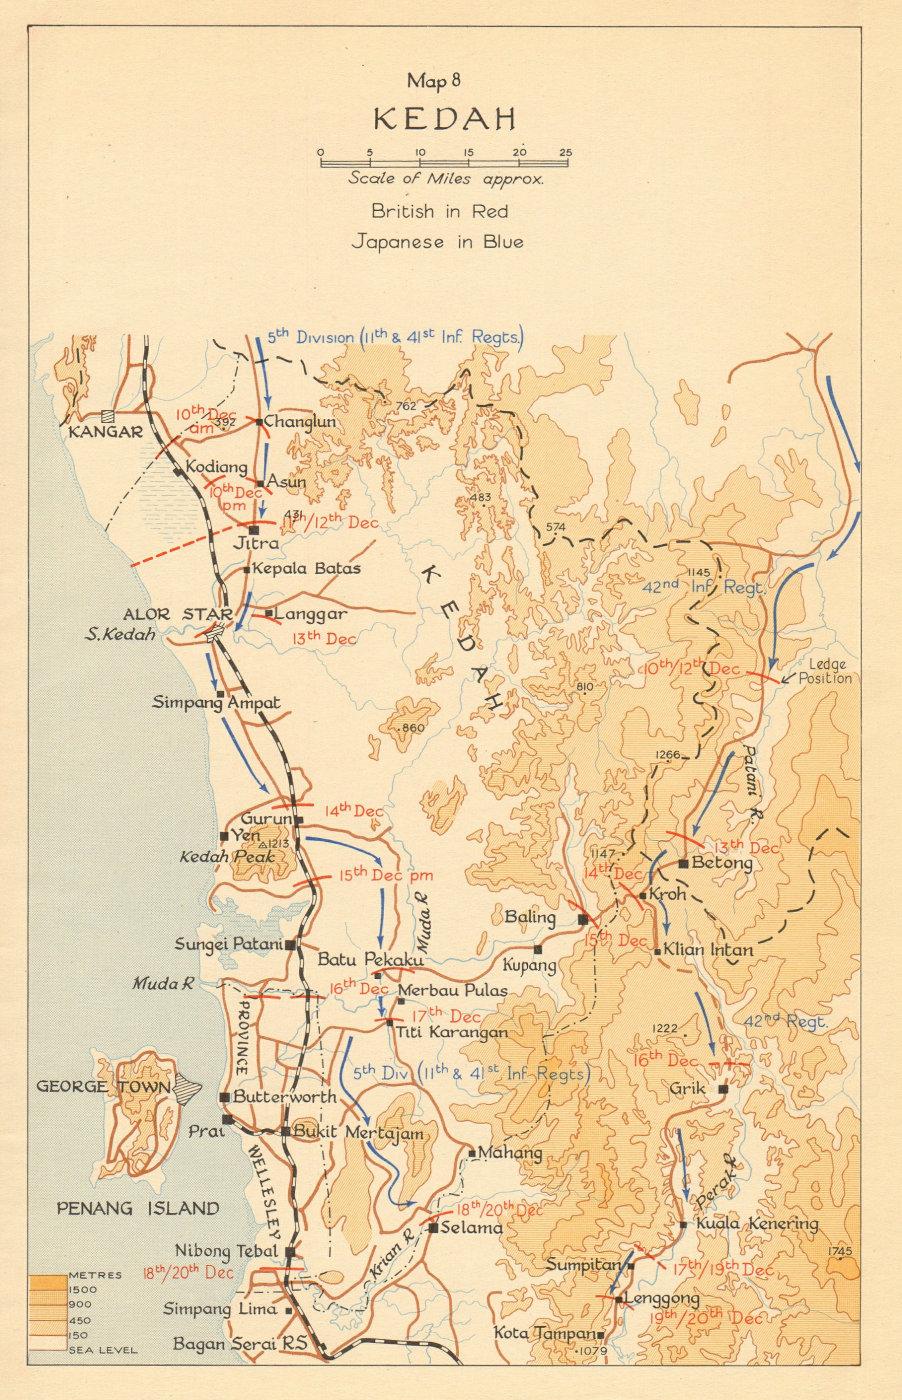 Associate Product Kedah. Japanese invasion of Malaya. December 1941 1957 old vintage map chart